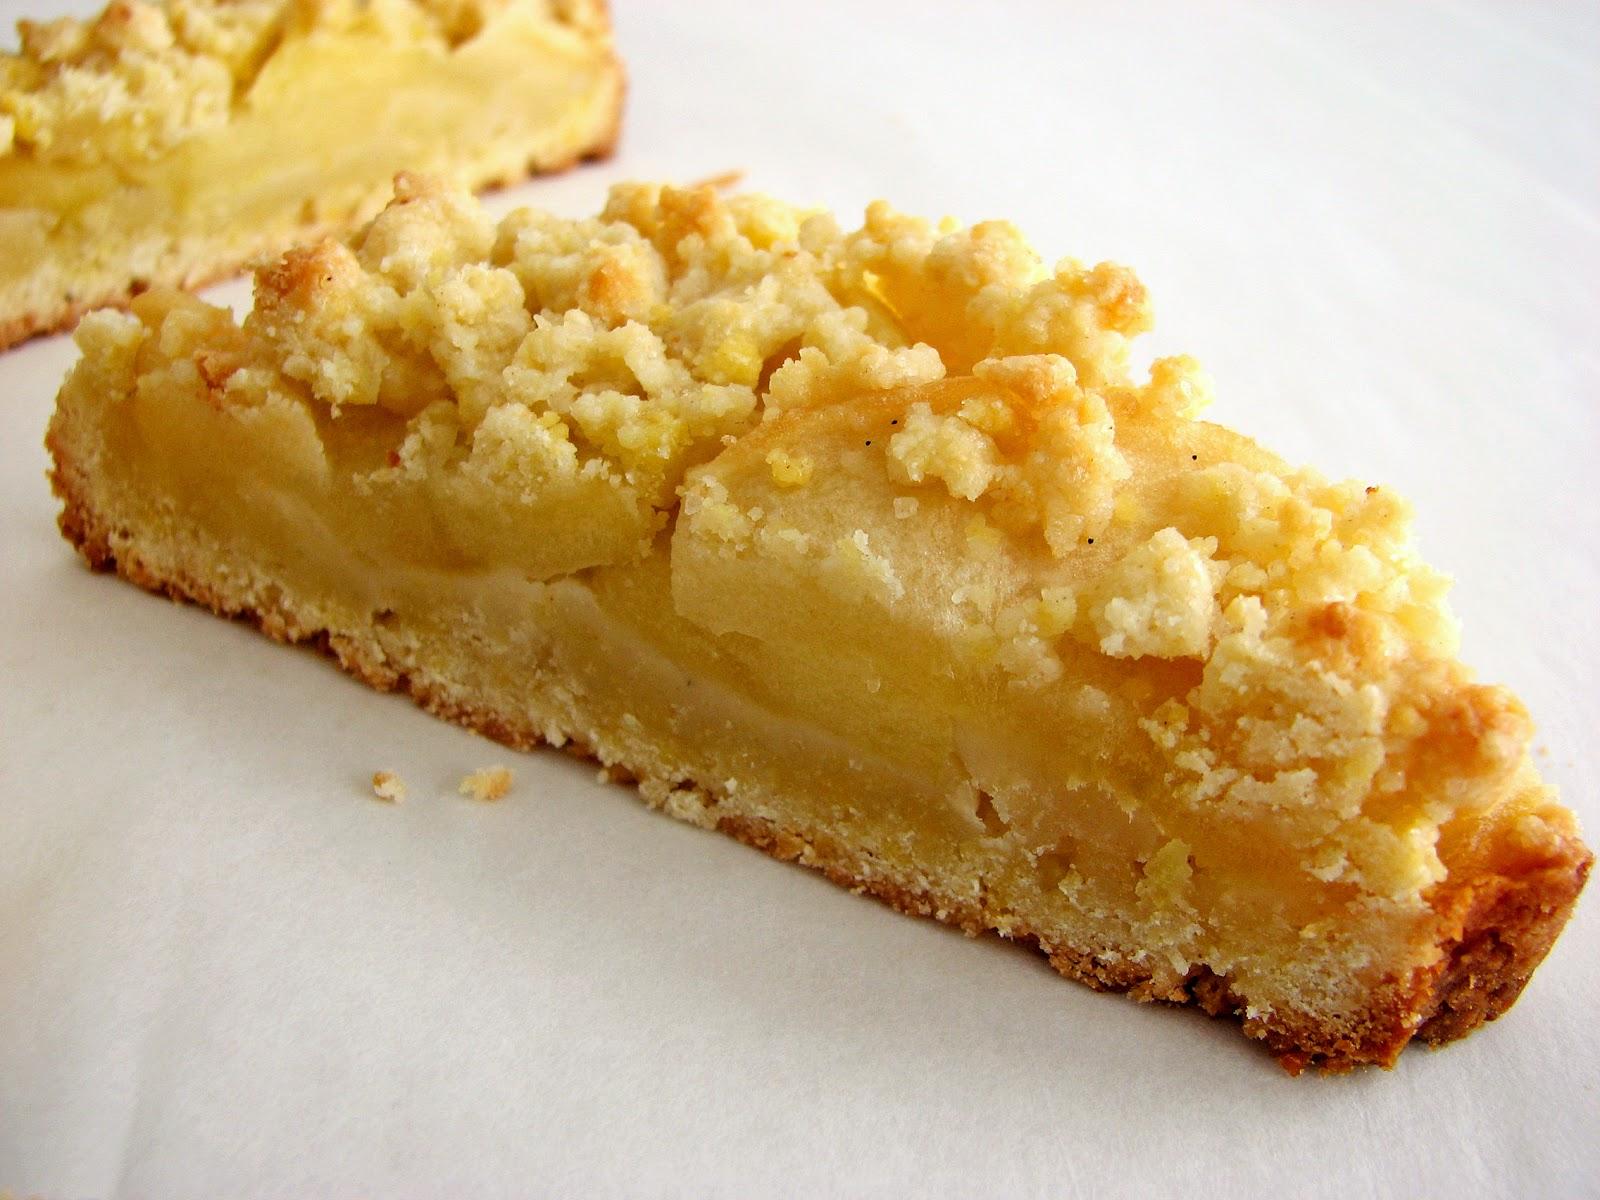 ... apple tart classic apple tart recipe french apple tart apple tart